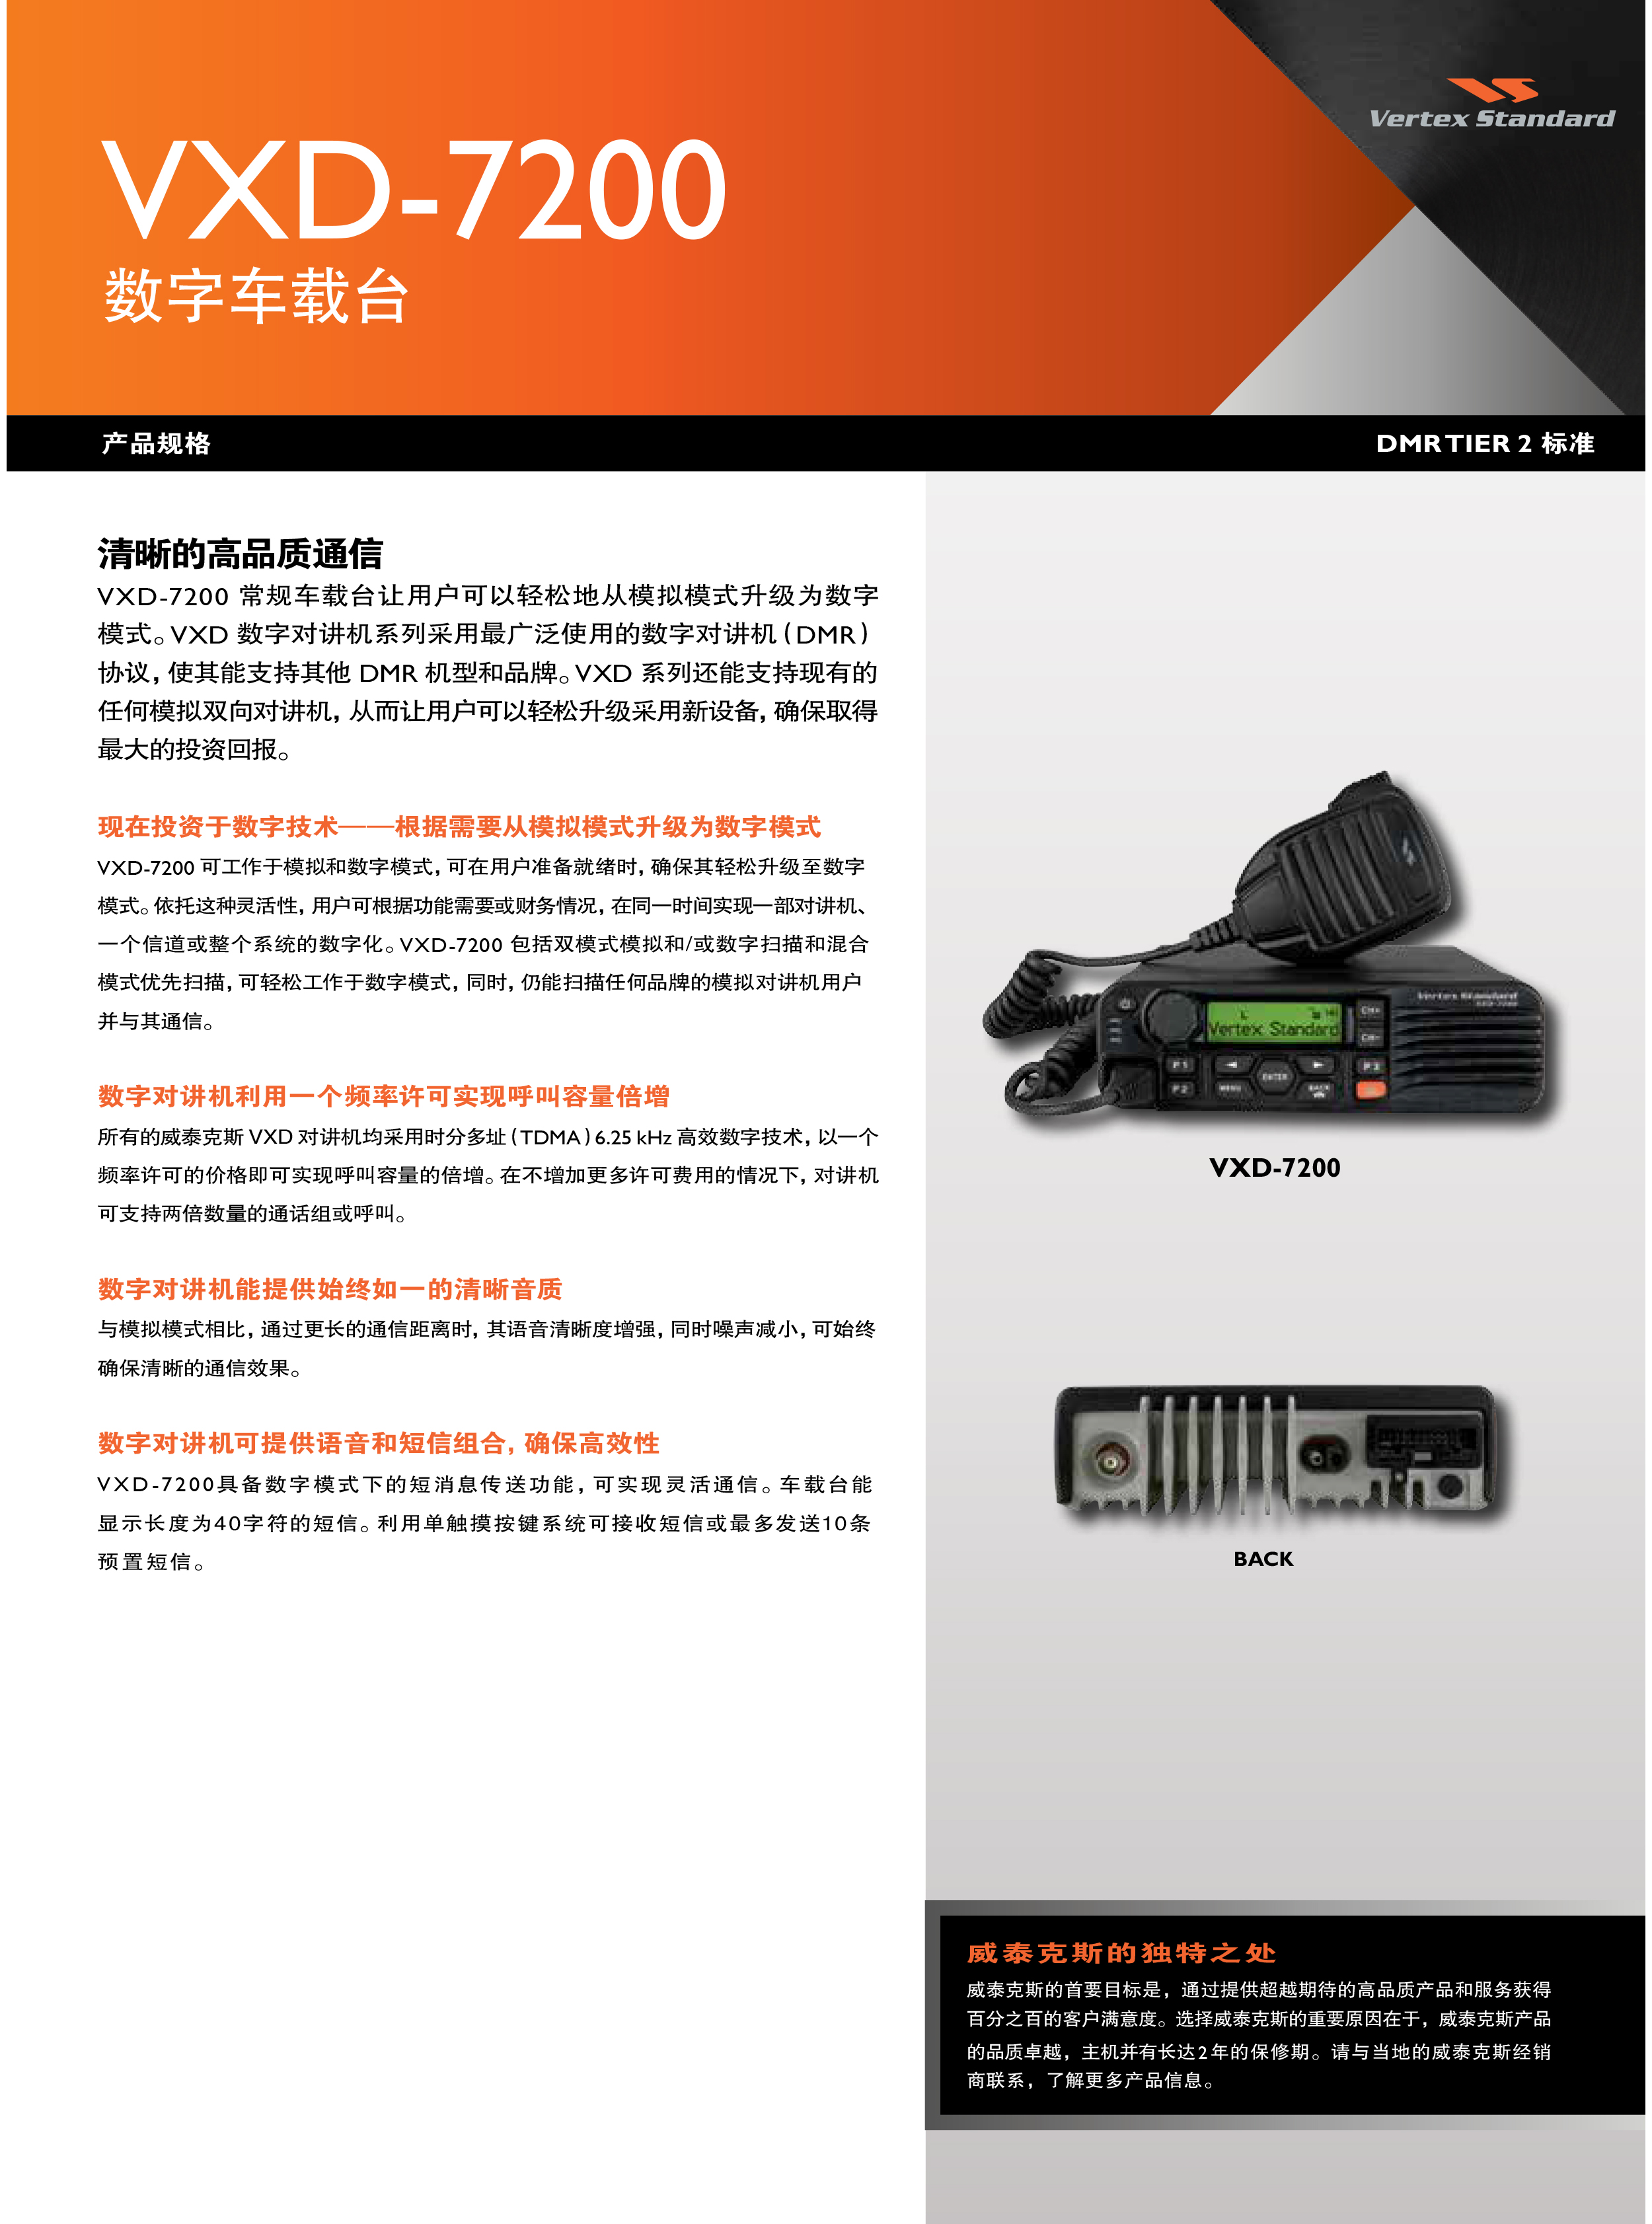 VXD-7200彩页_01